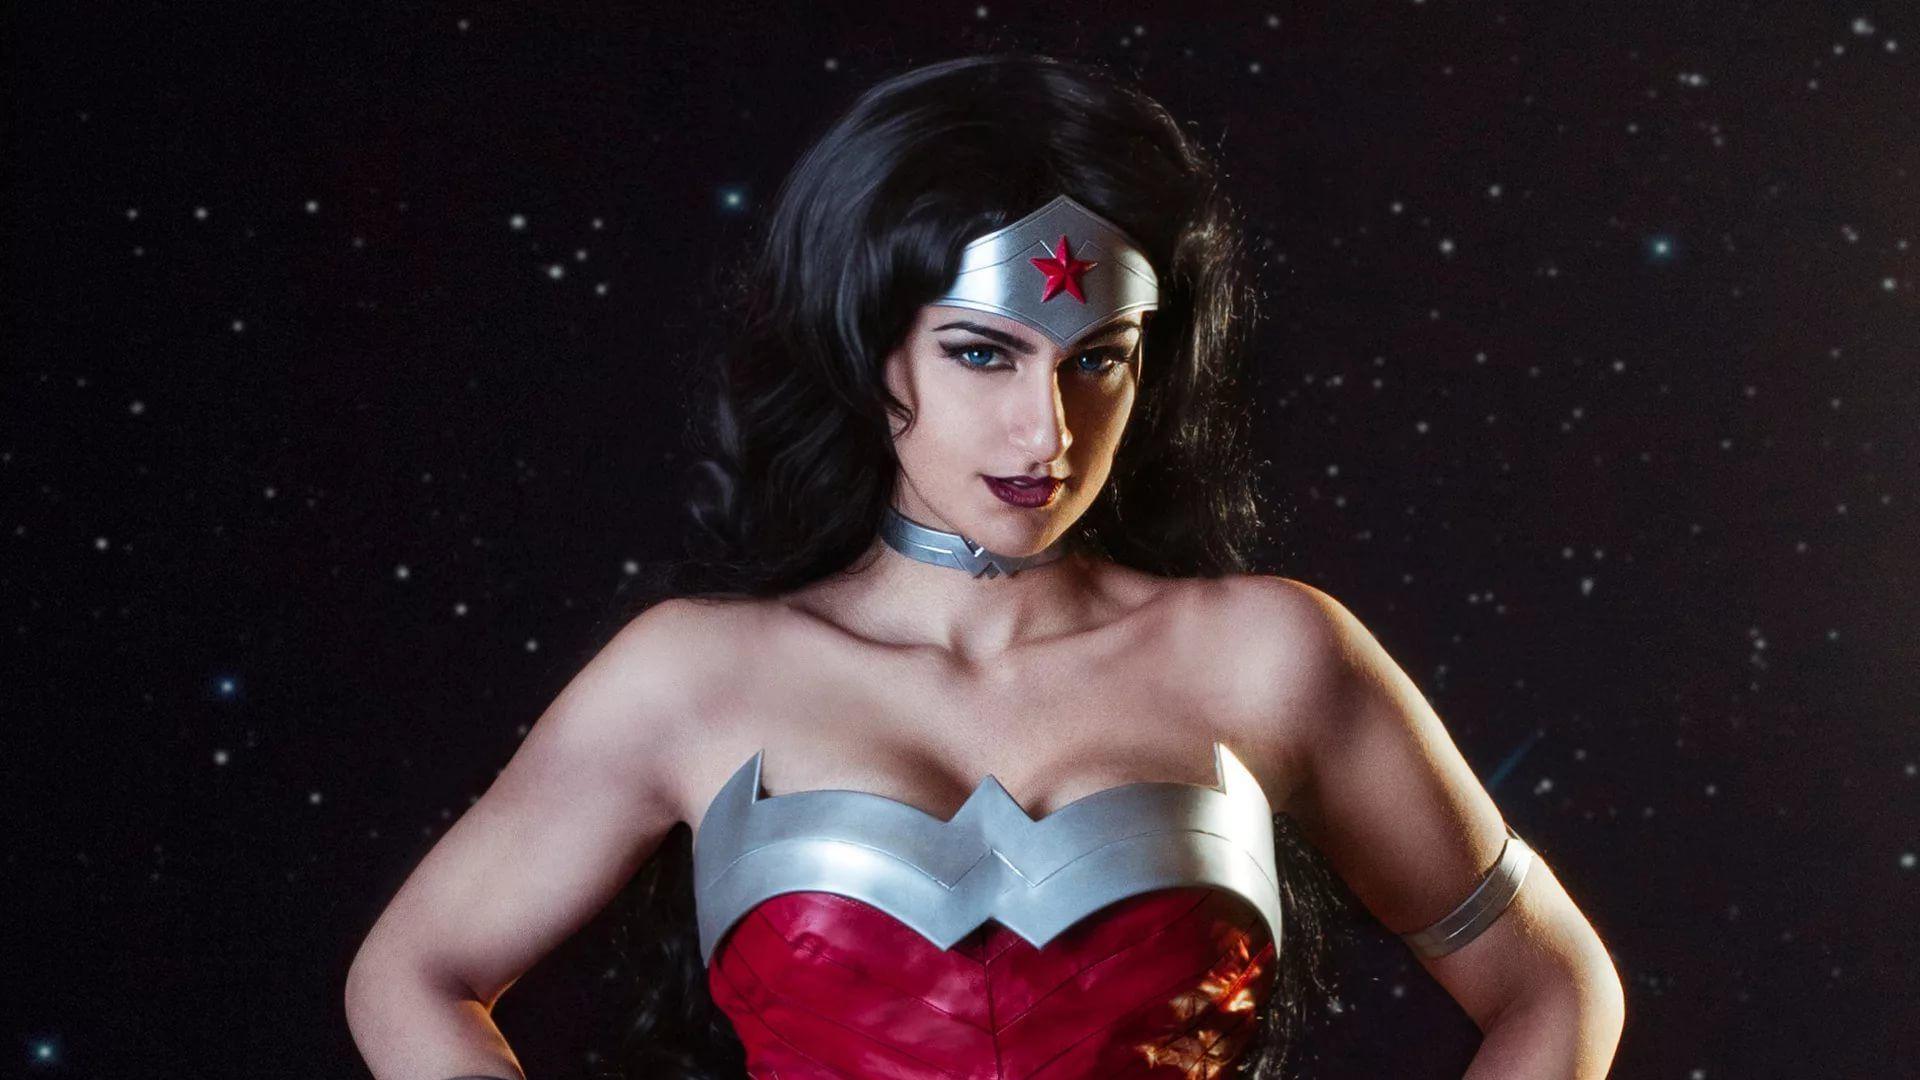 Wonder Woman Hot hd wallpaper